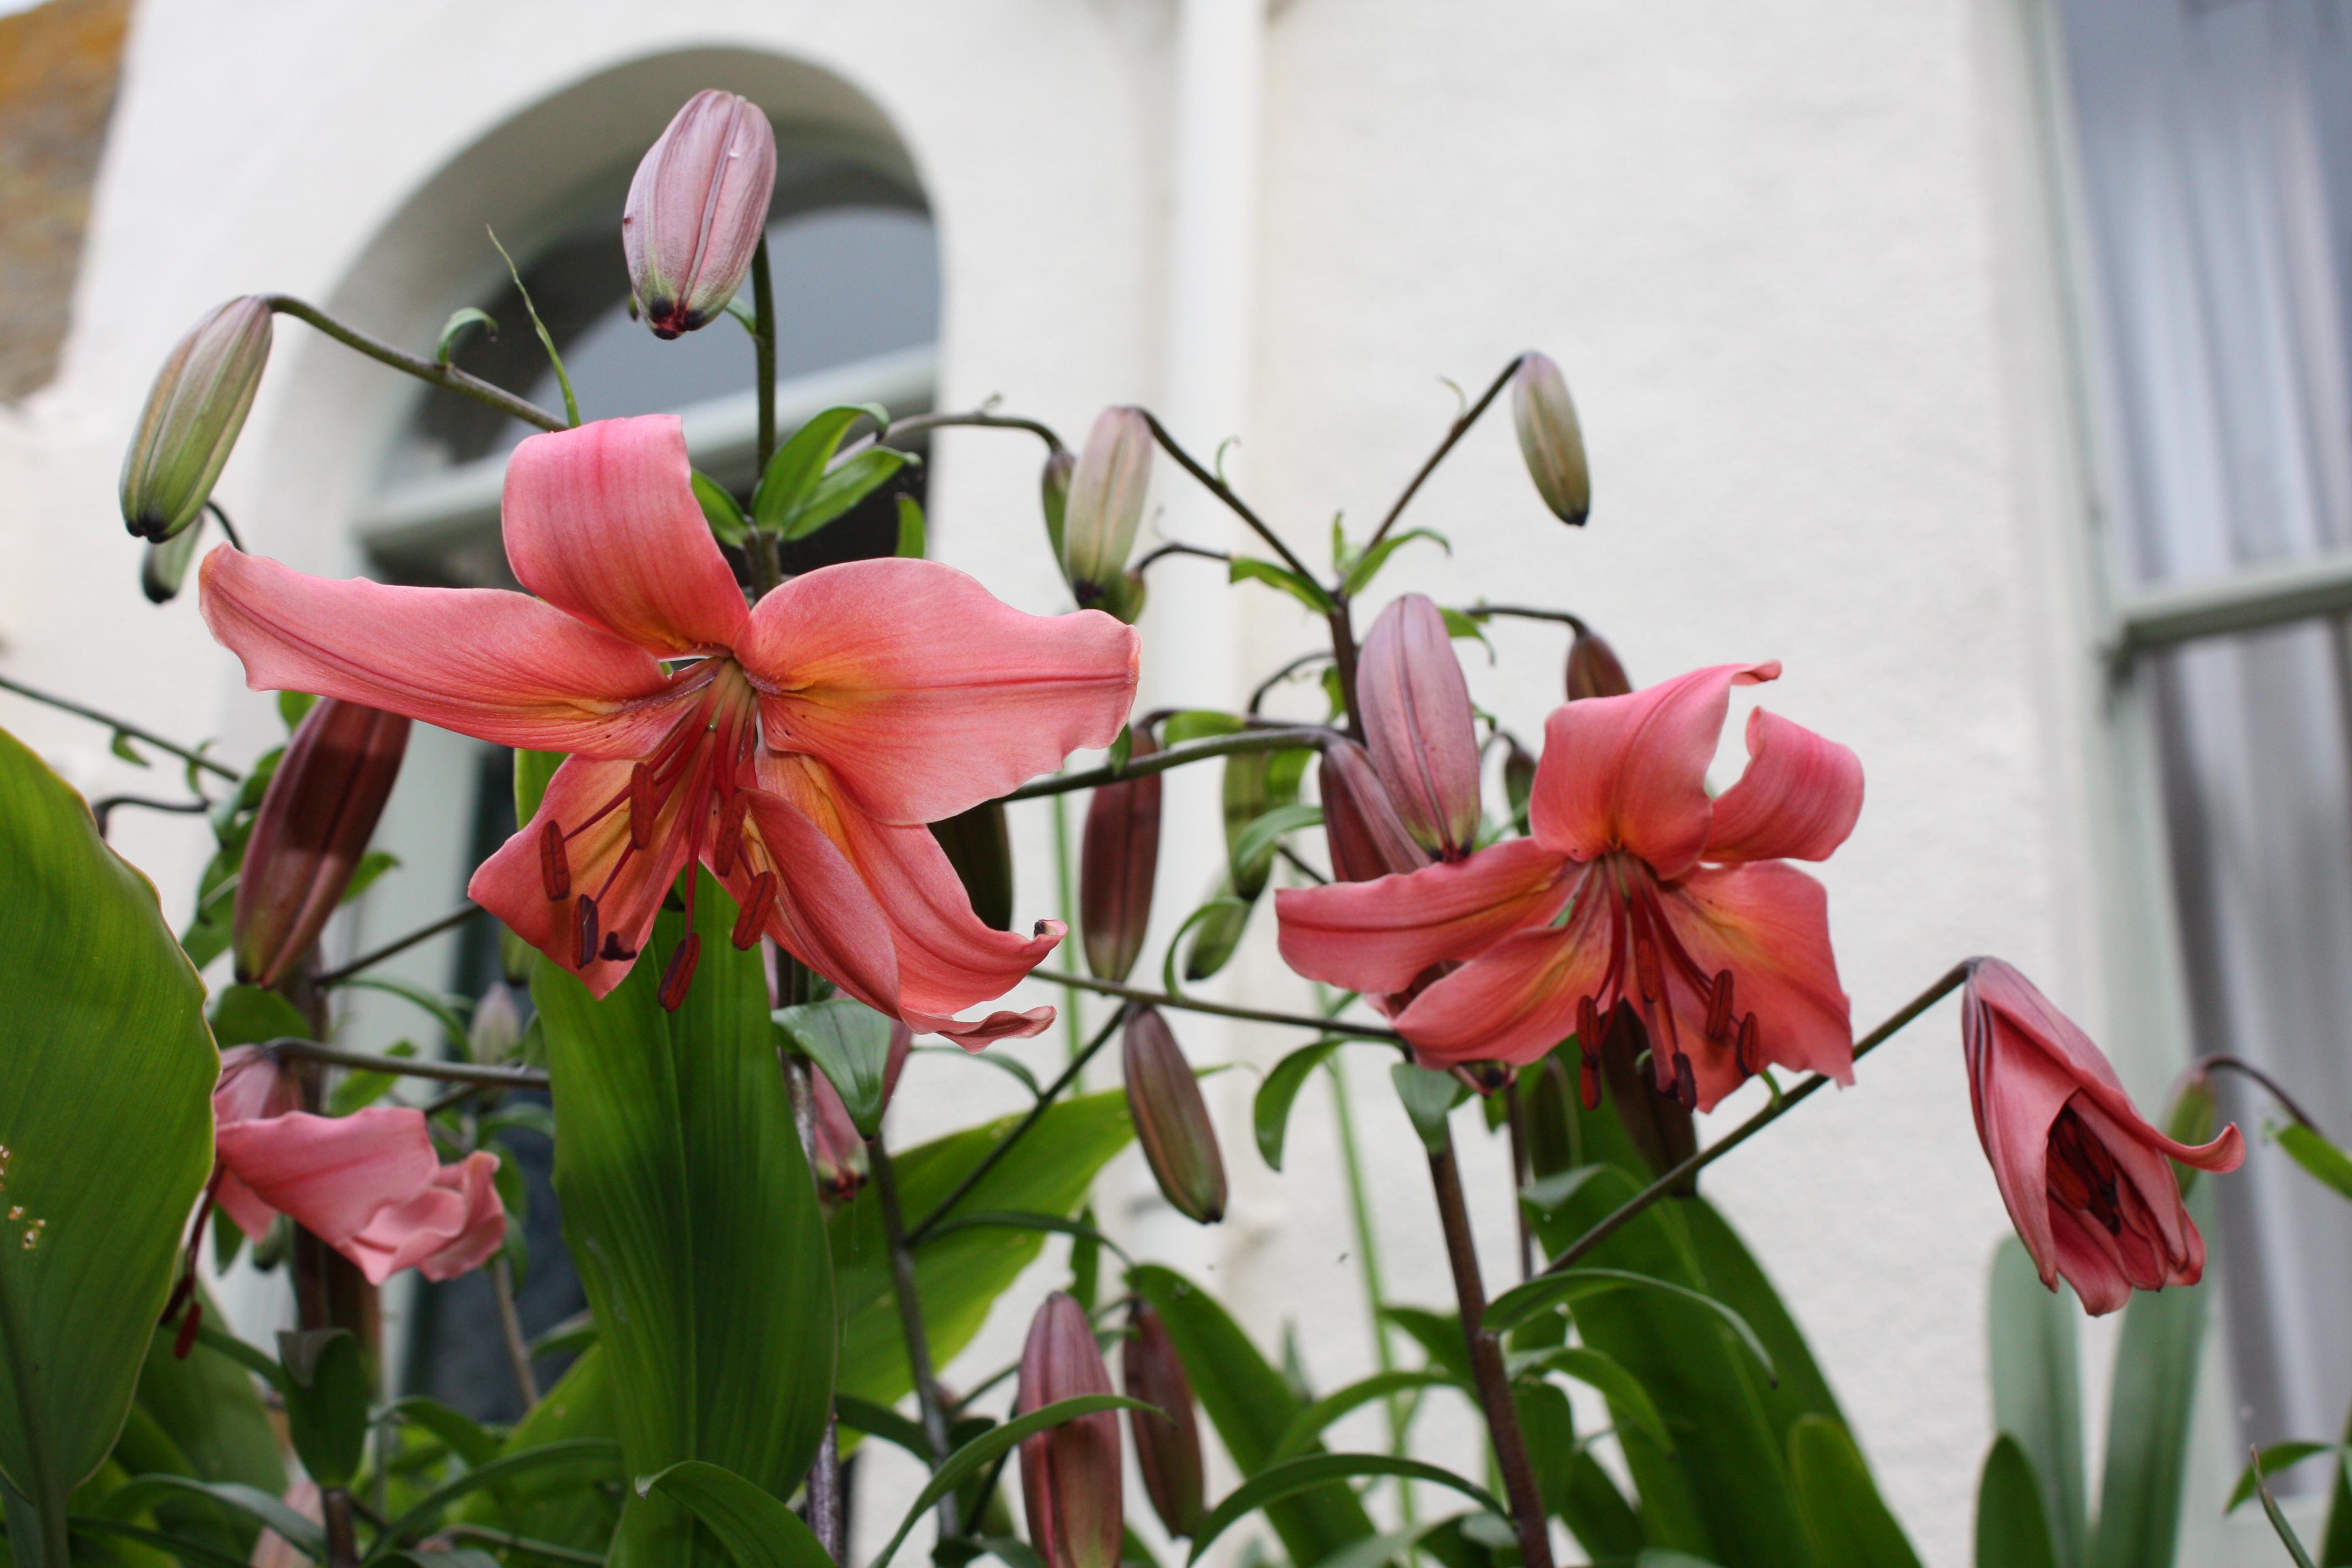 daily flower candy  lilium  u2018pink flavour u2019  u2013 the frustrated gardener